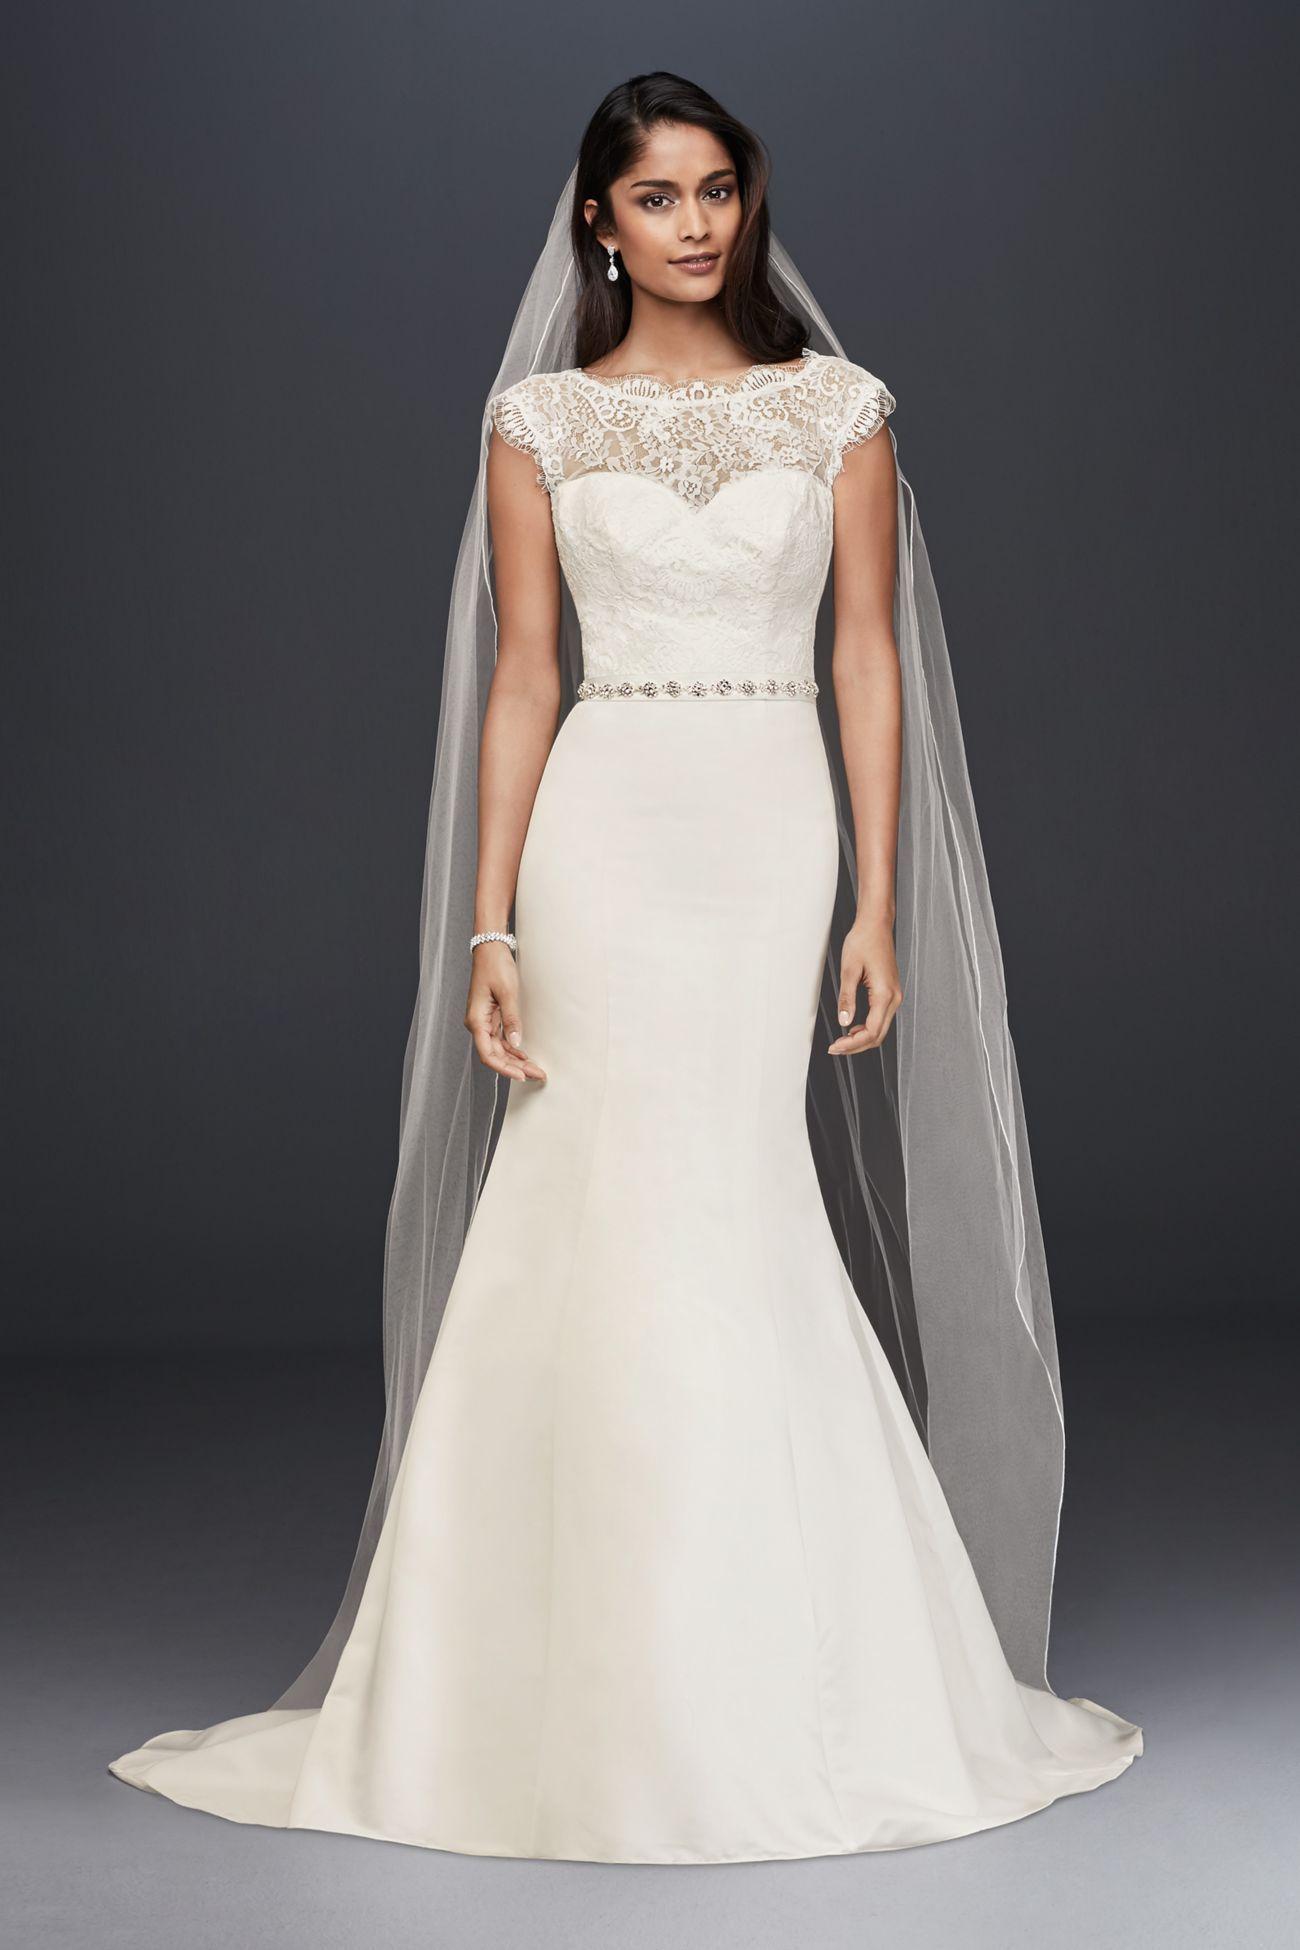 Wg grooms pinterest mermaid wedding dresses illusions and